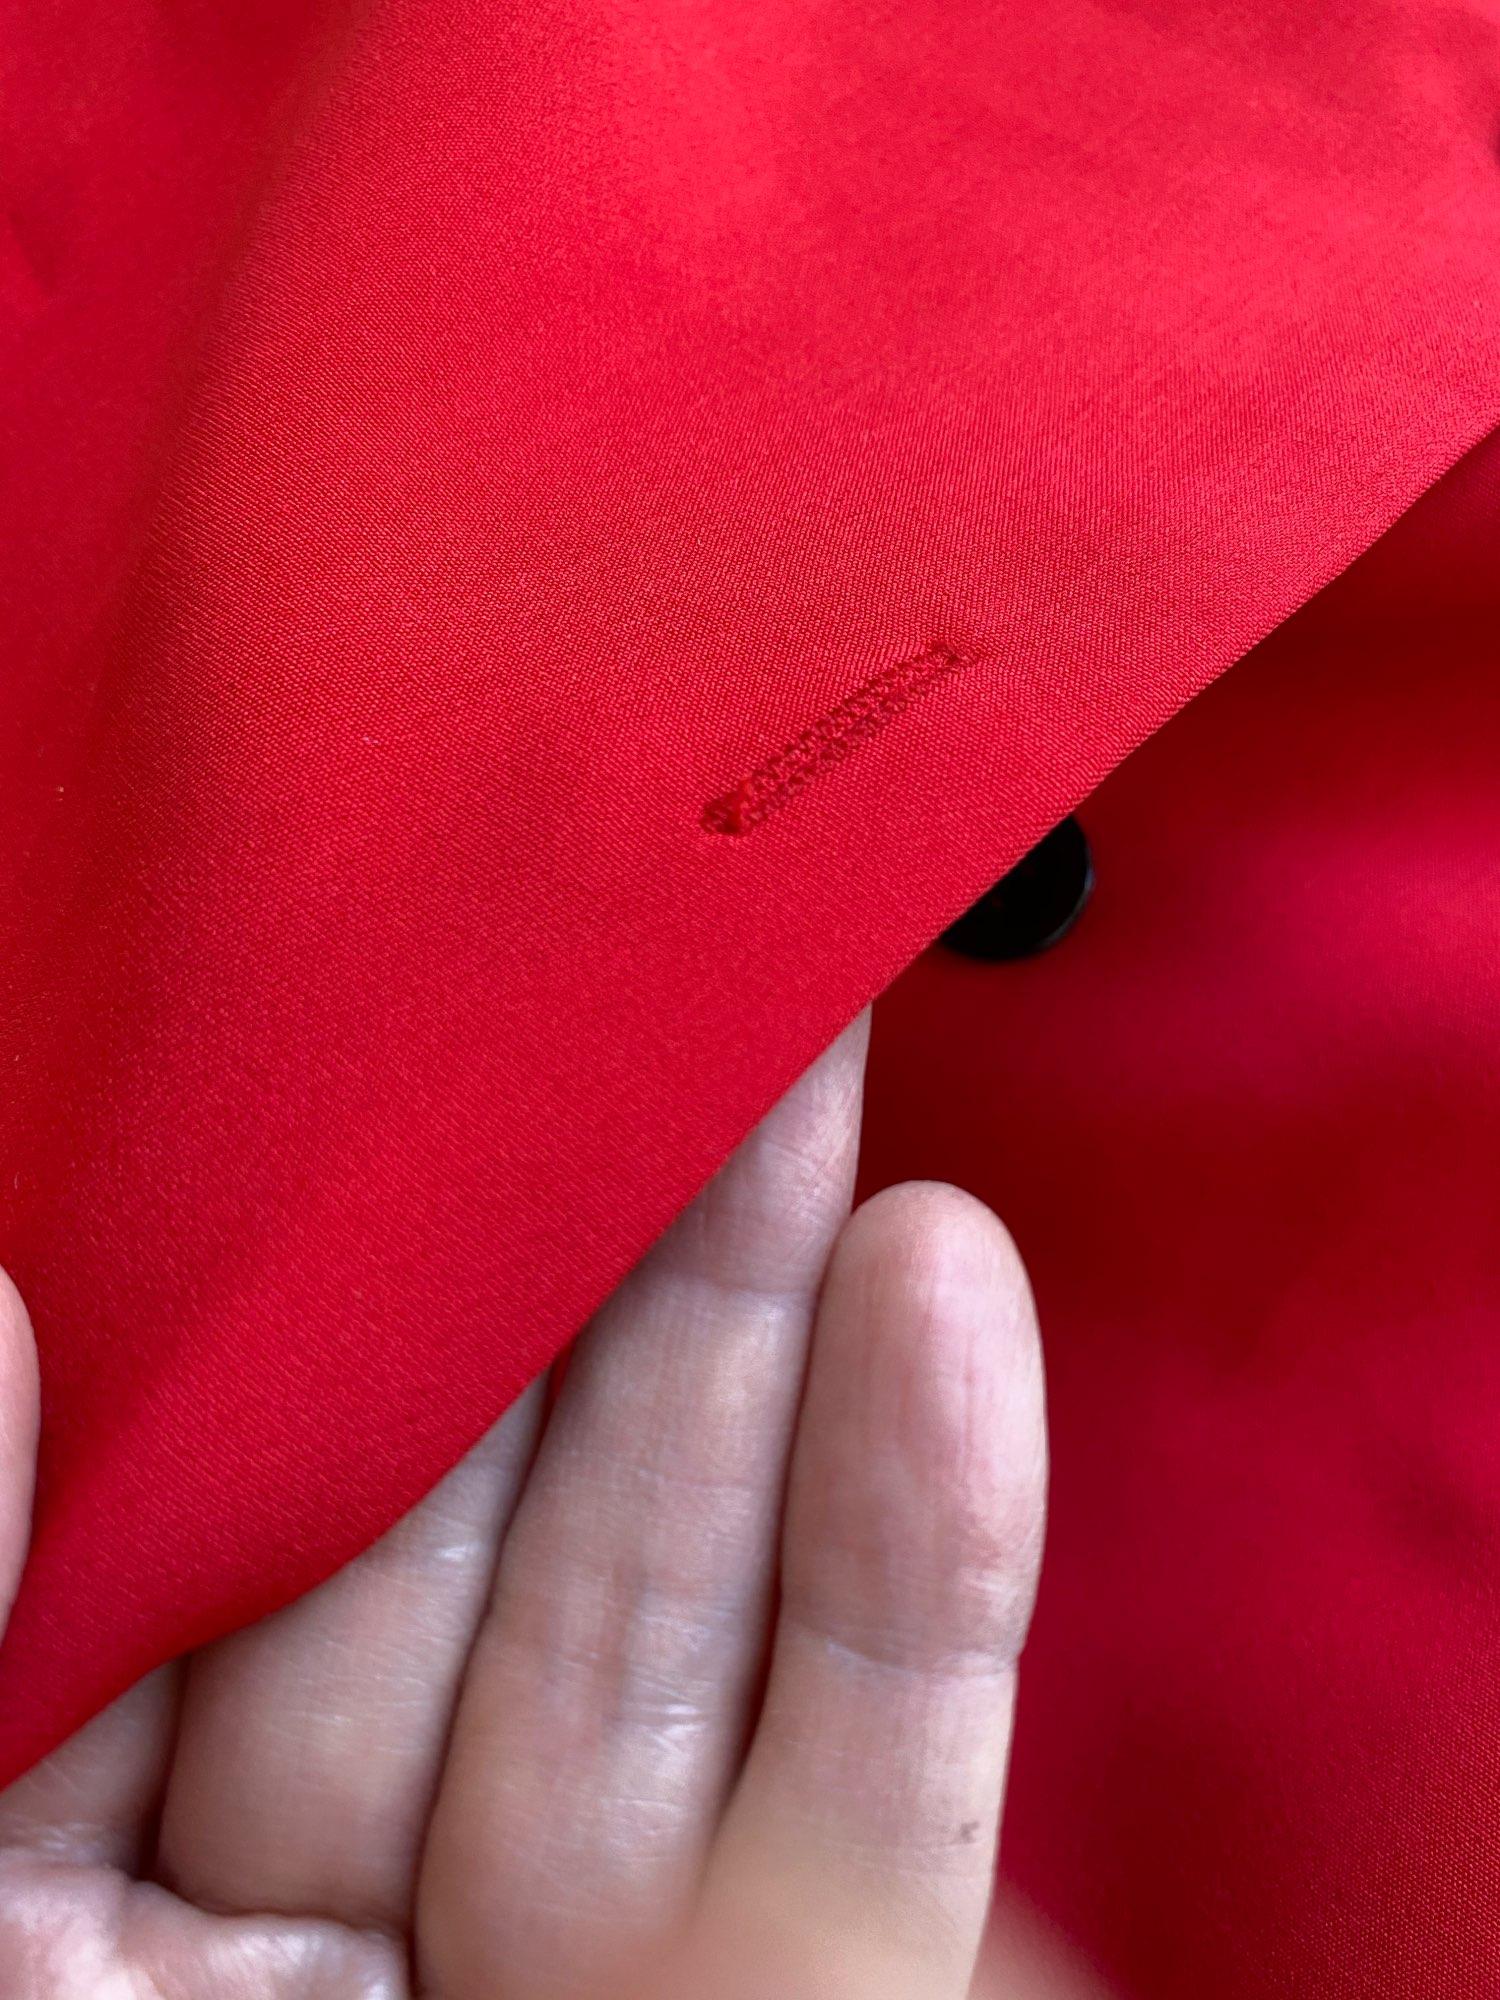 Sexy v Neck Autumn Long Sleeve Women Dress Ladies Sashes Button Casual Office Dress 2021New Fashion Women Midi Dress Vintage|Dresses|   - AliExpress